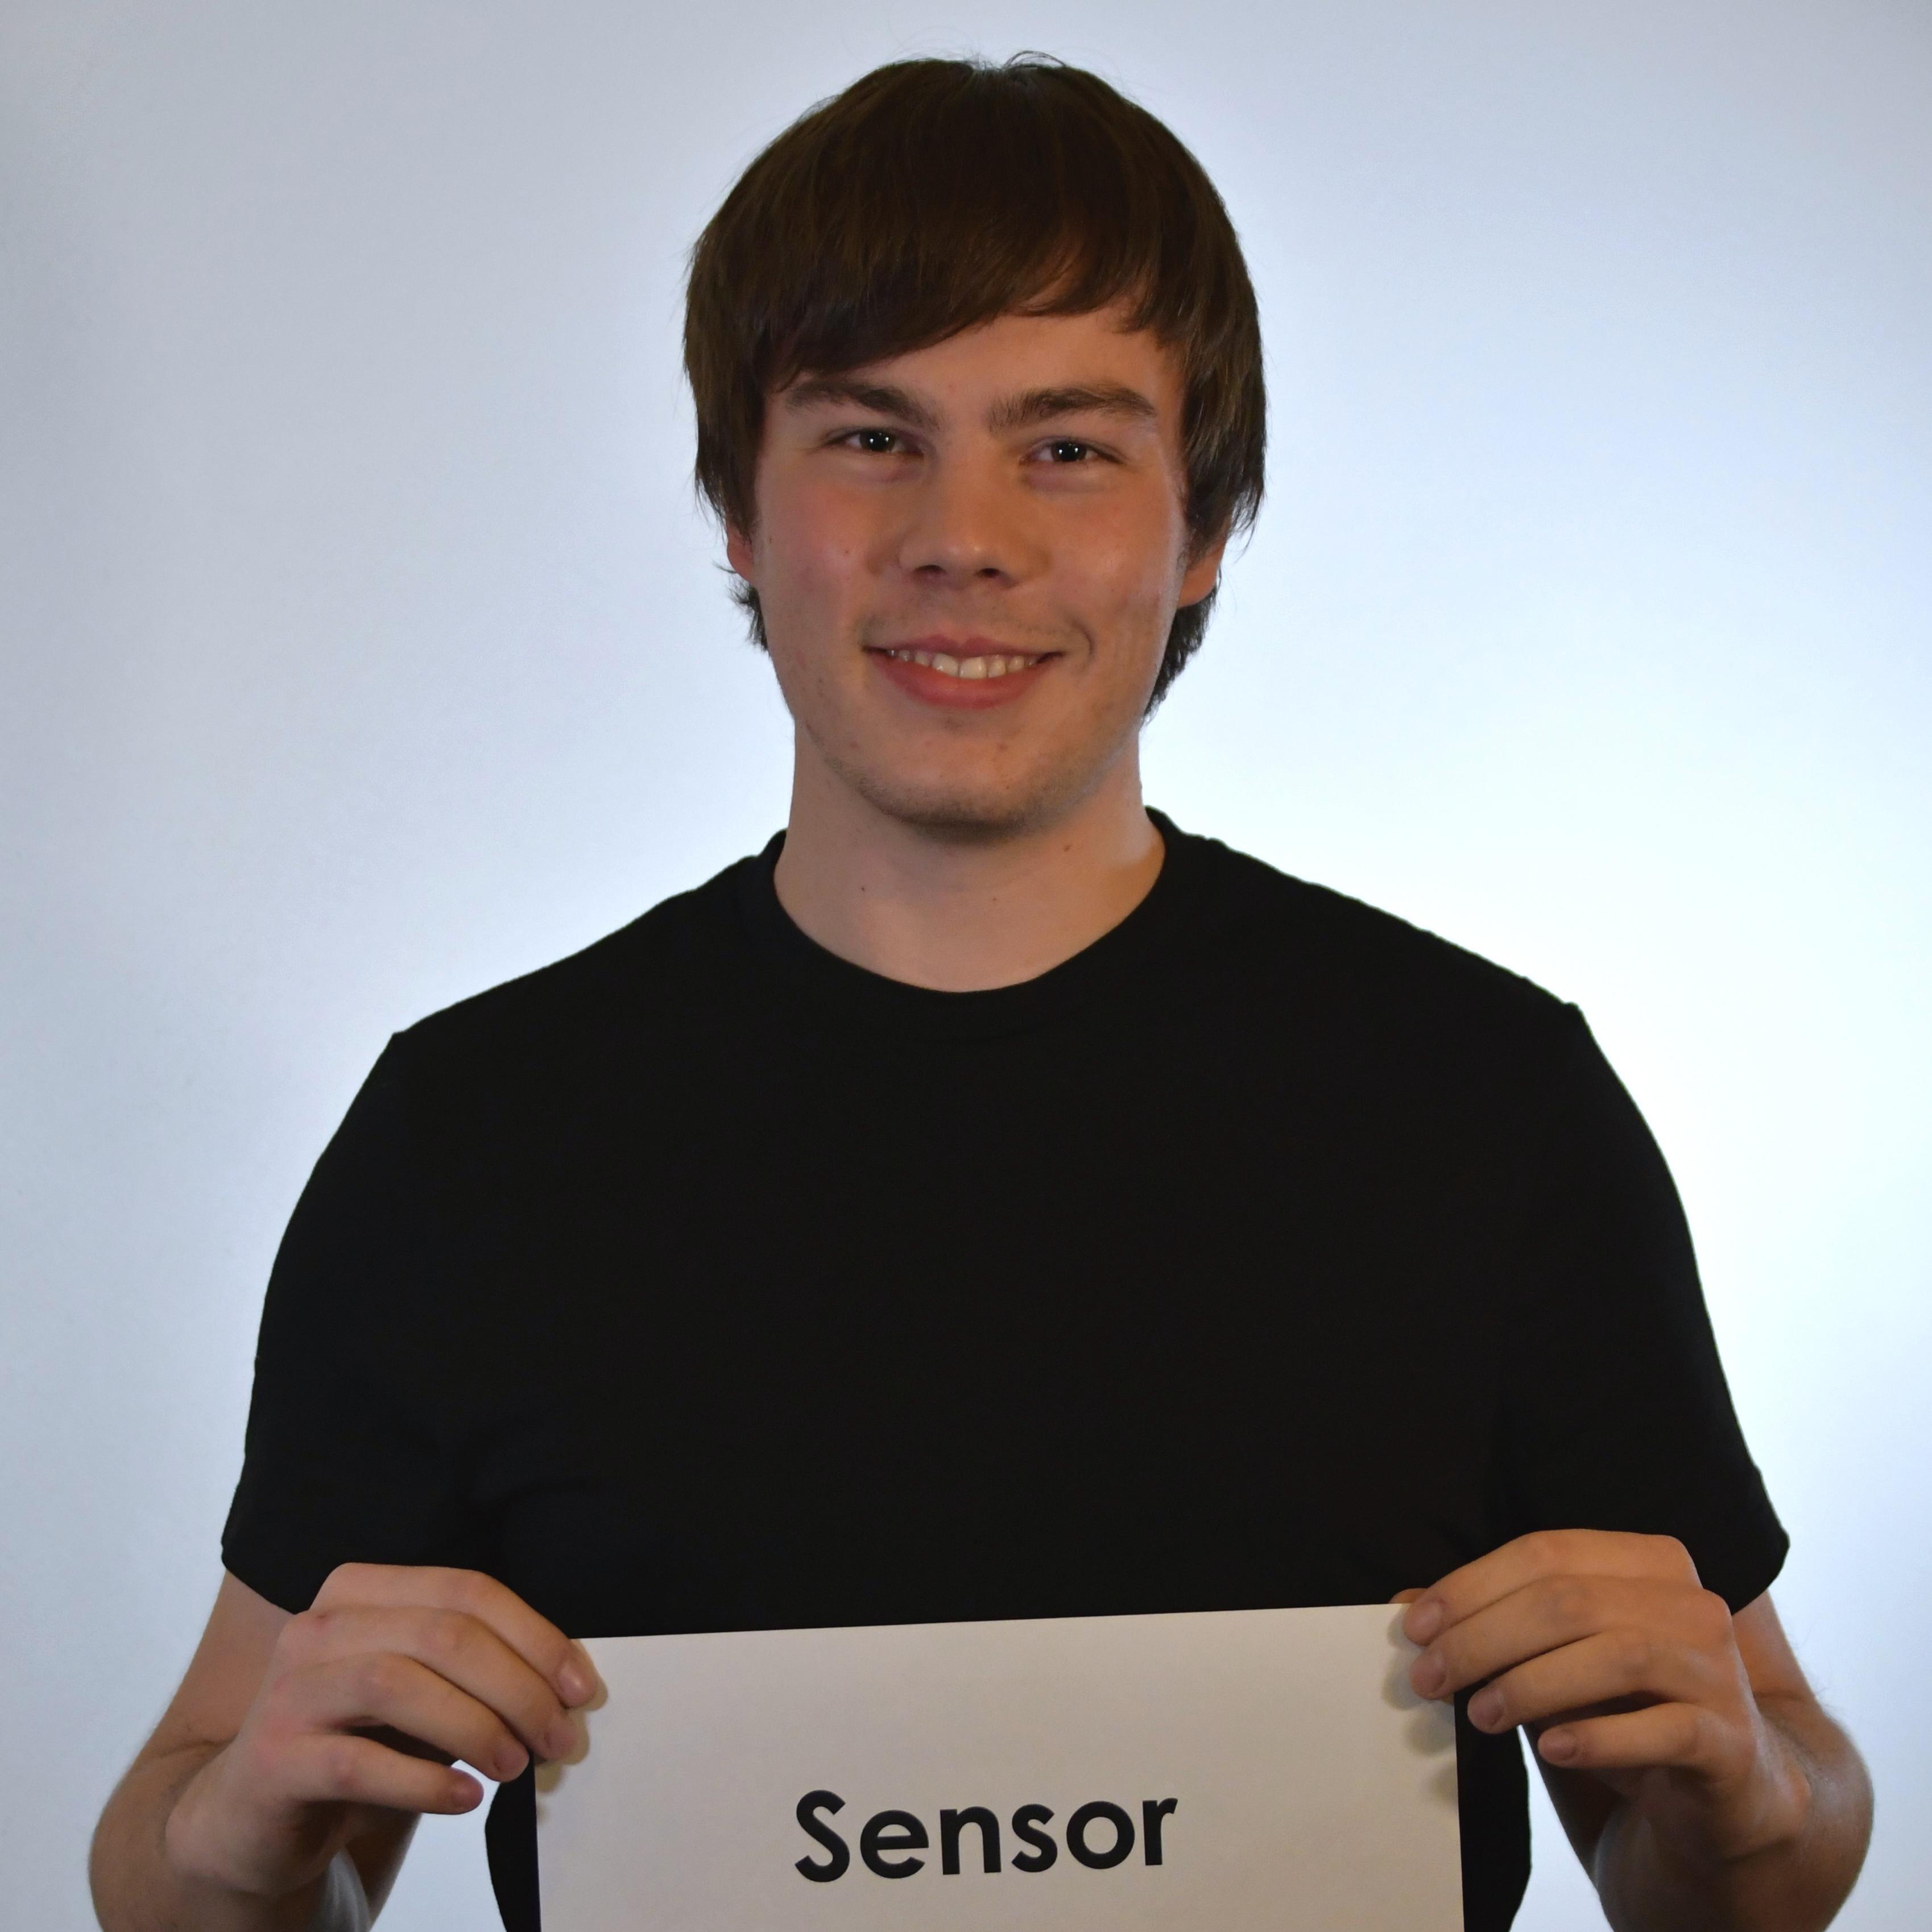 Tita Oberbacher – Subteamleader Sensor, Deploy & Recovery Mechanism